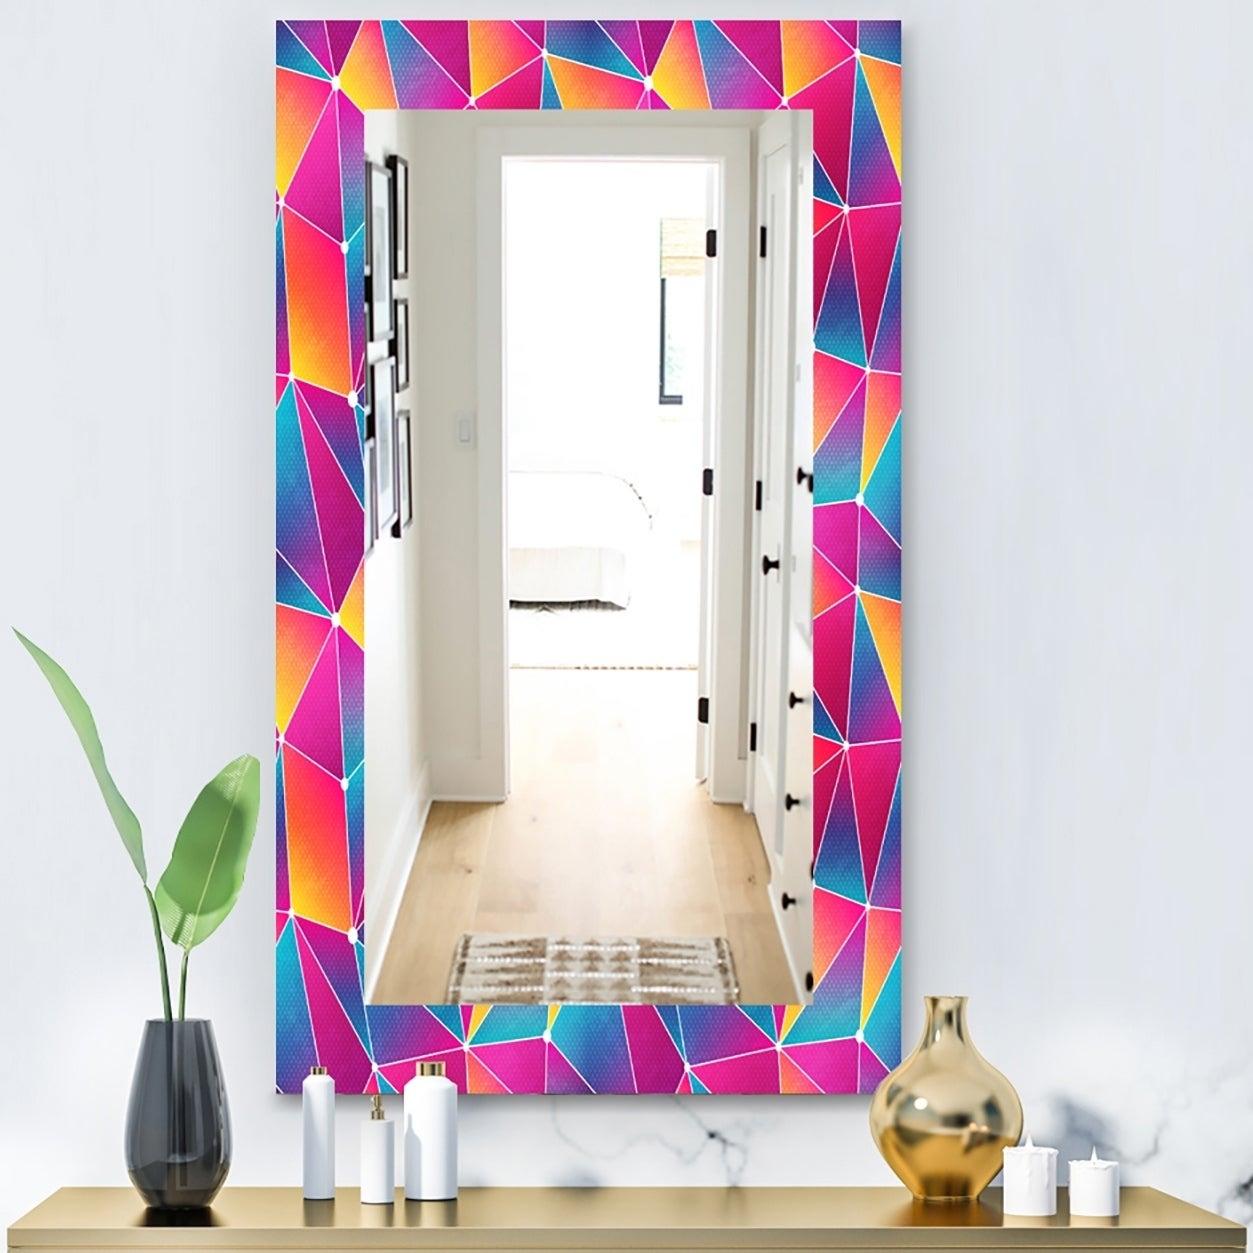 Designart Bright Triangle With Grunge Effect Modern Mirror - Frameless Vanity Mirror - Blue (29.5 in. wide x 39.4 in. high)